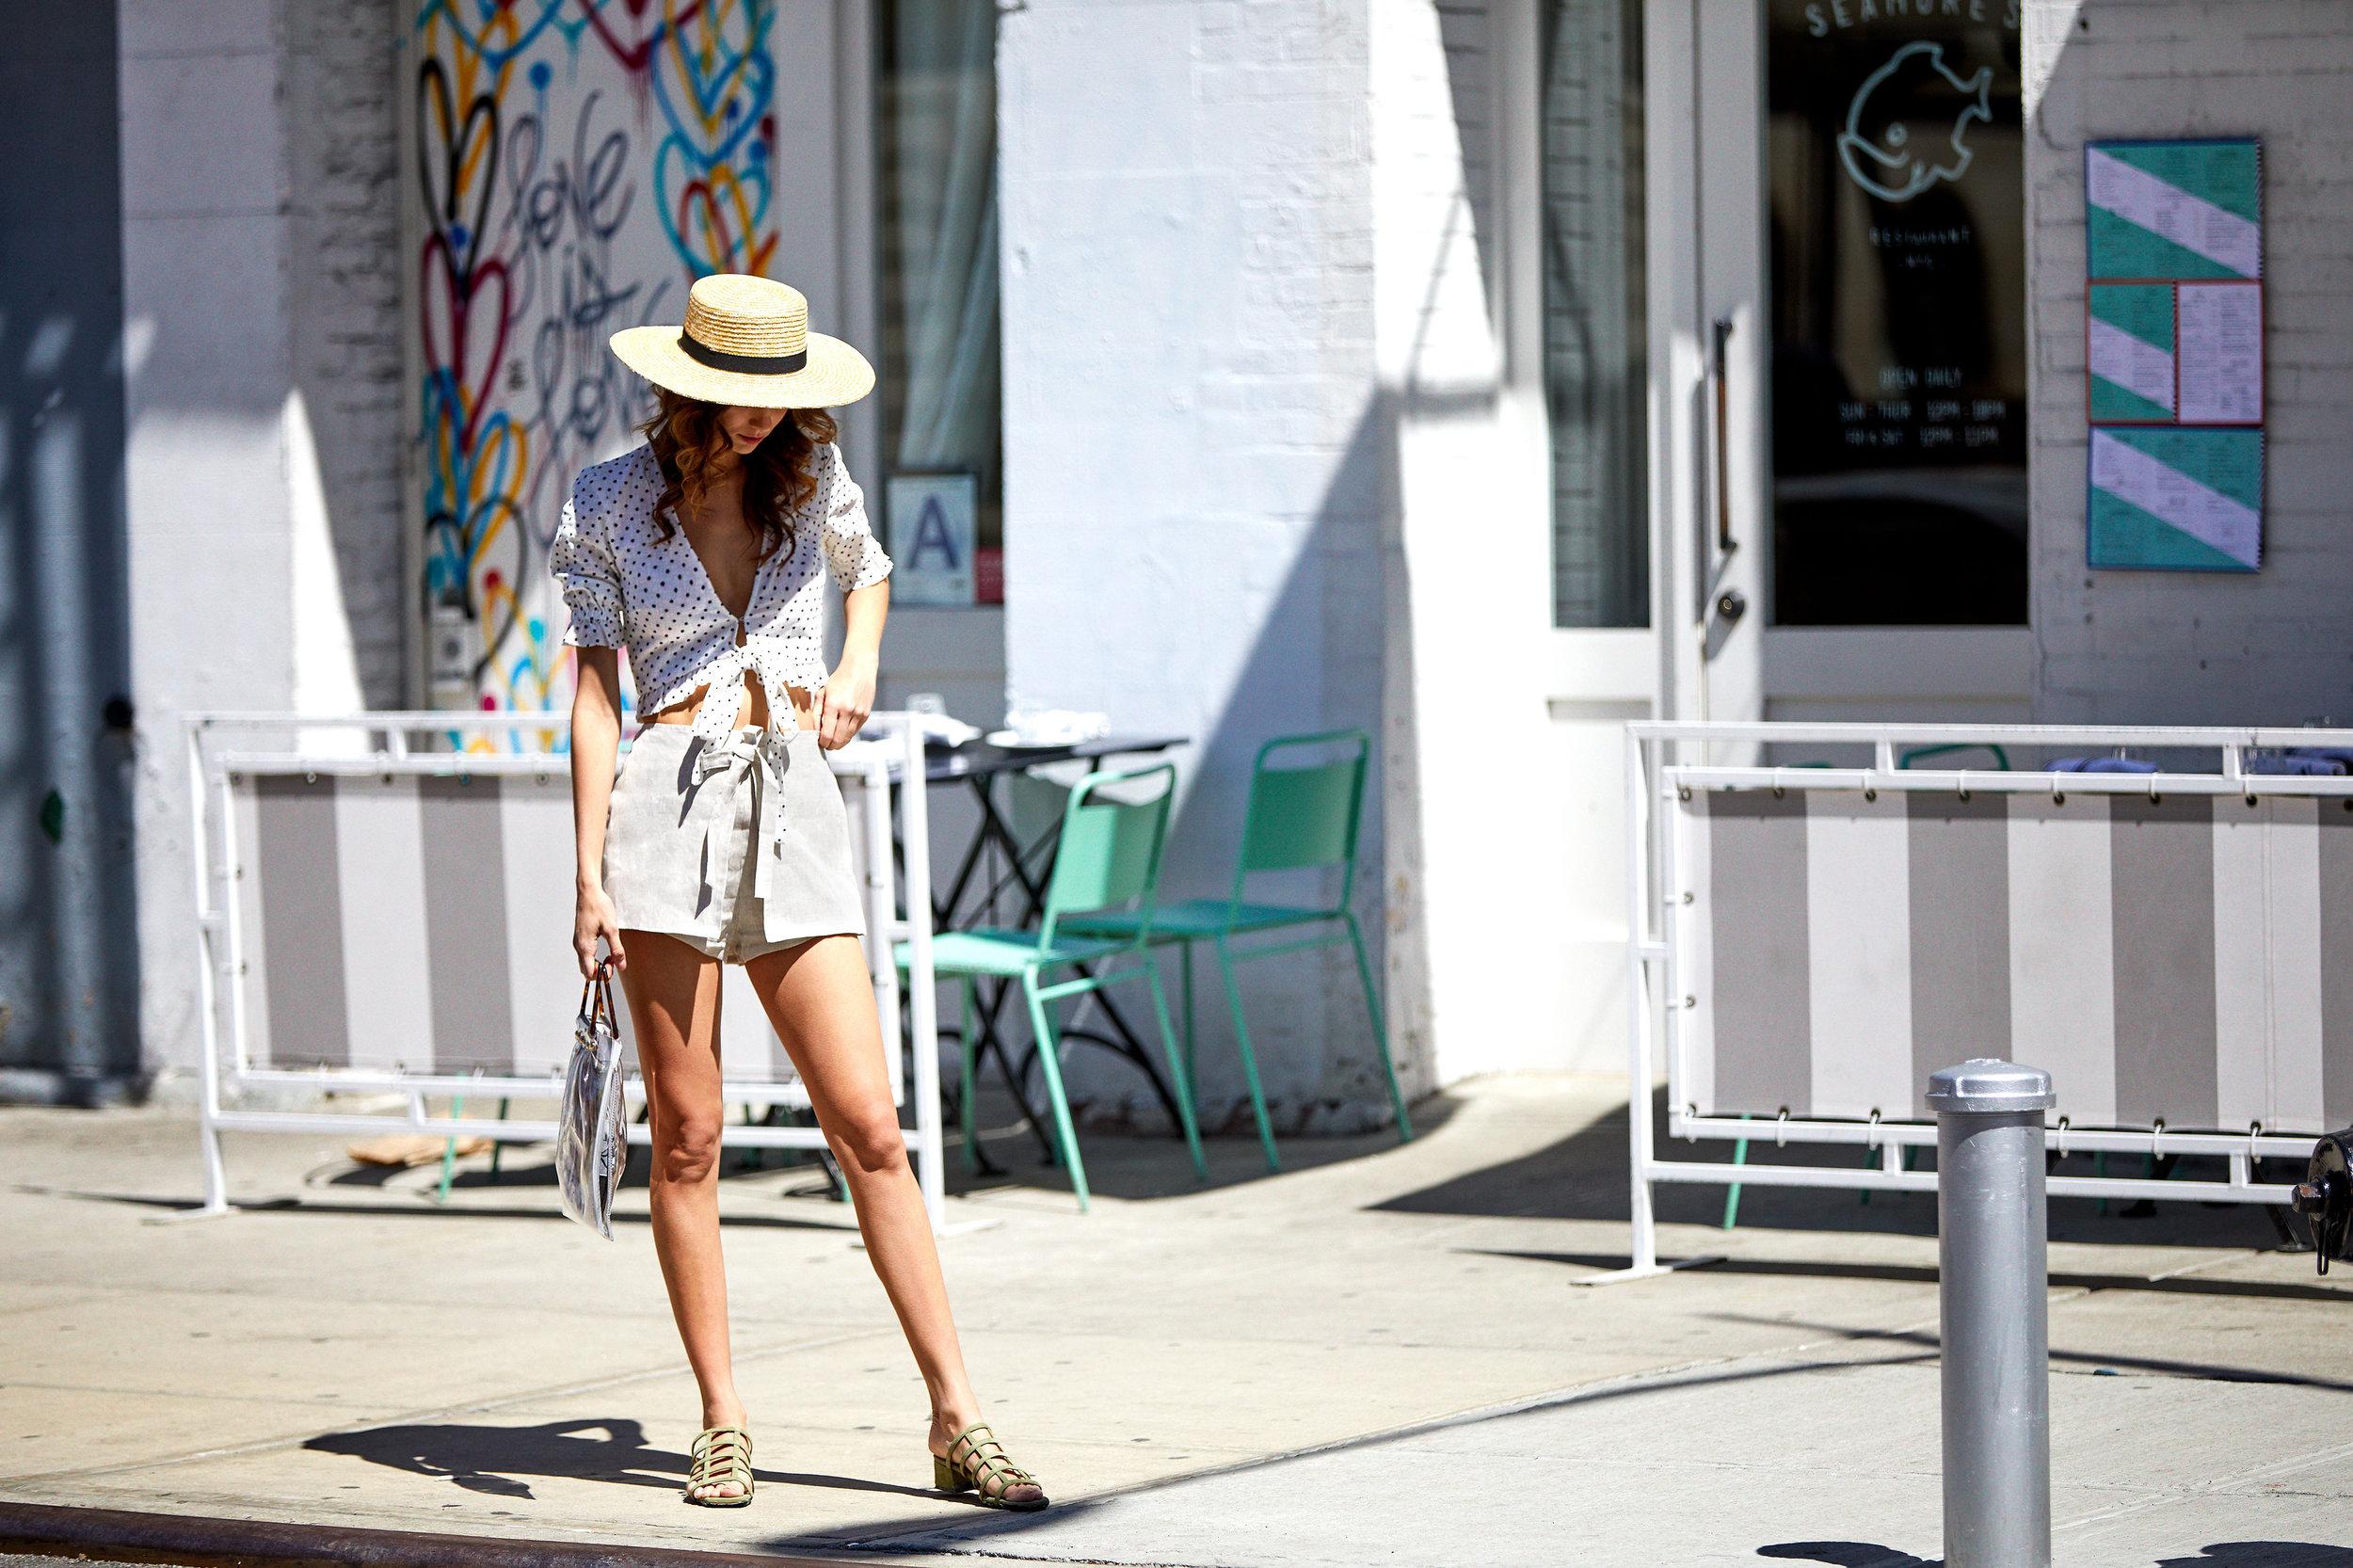 Petit Miam Polka Dot Tie Top & Ines Tie Shorts & Grid Green Suede Sandals